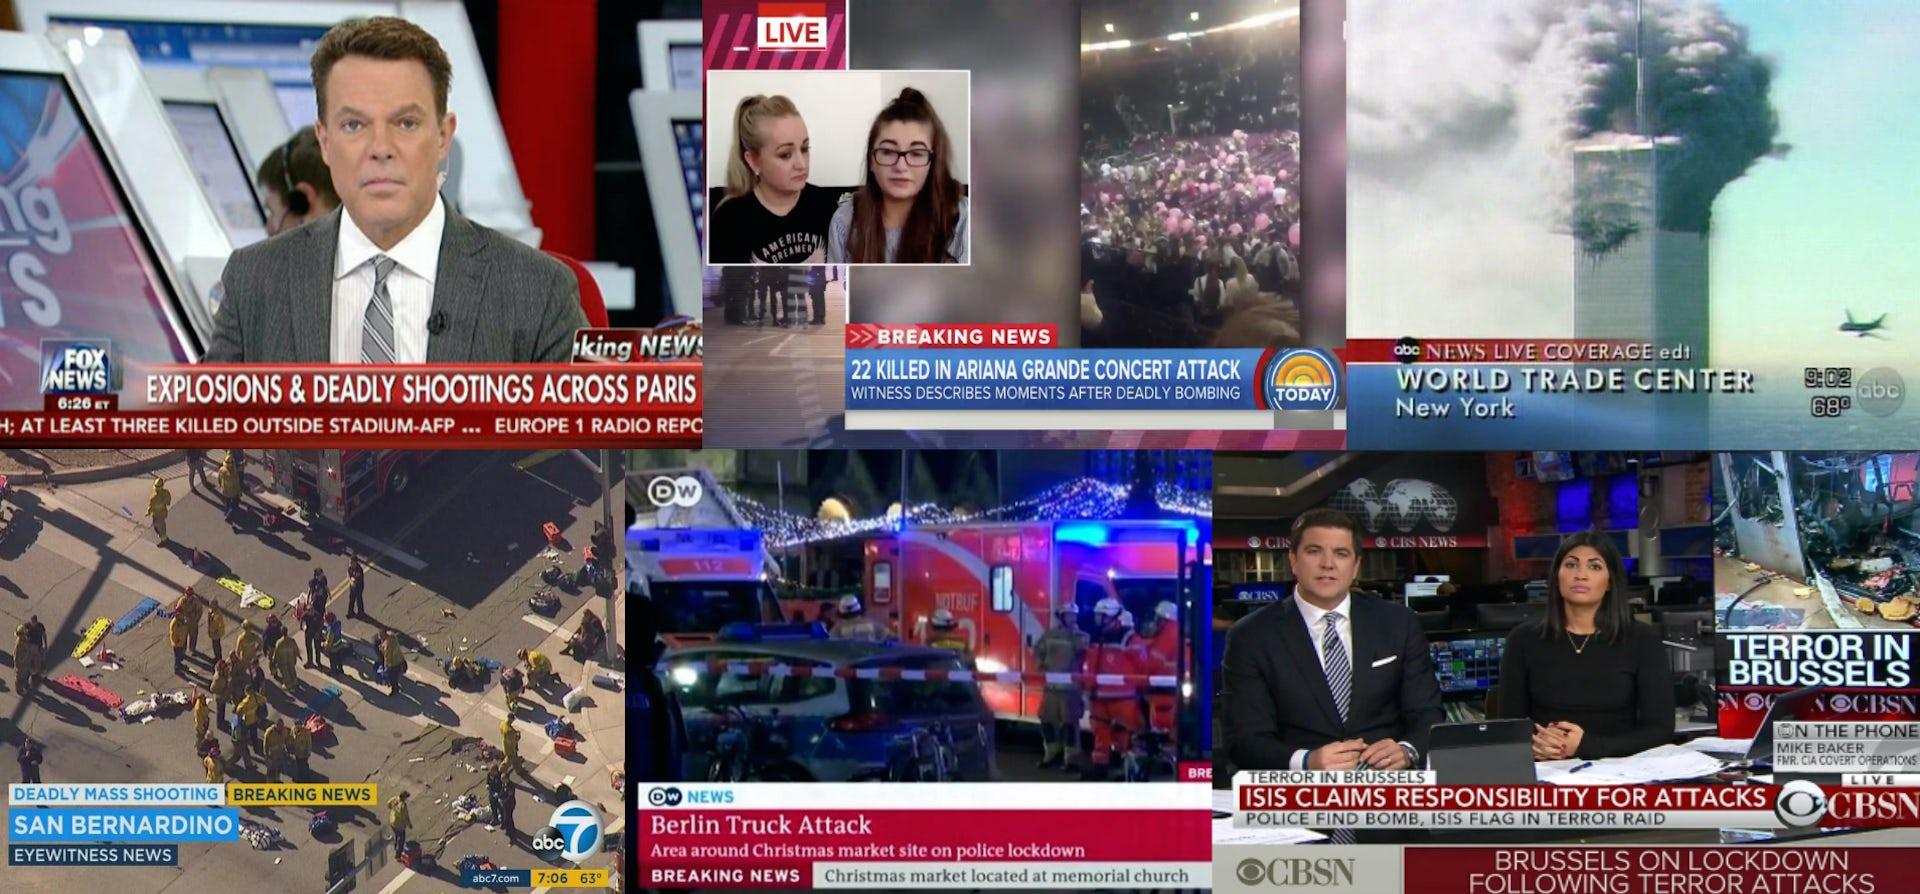 Islam And The Australian News Media